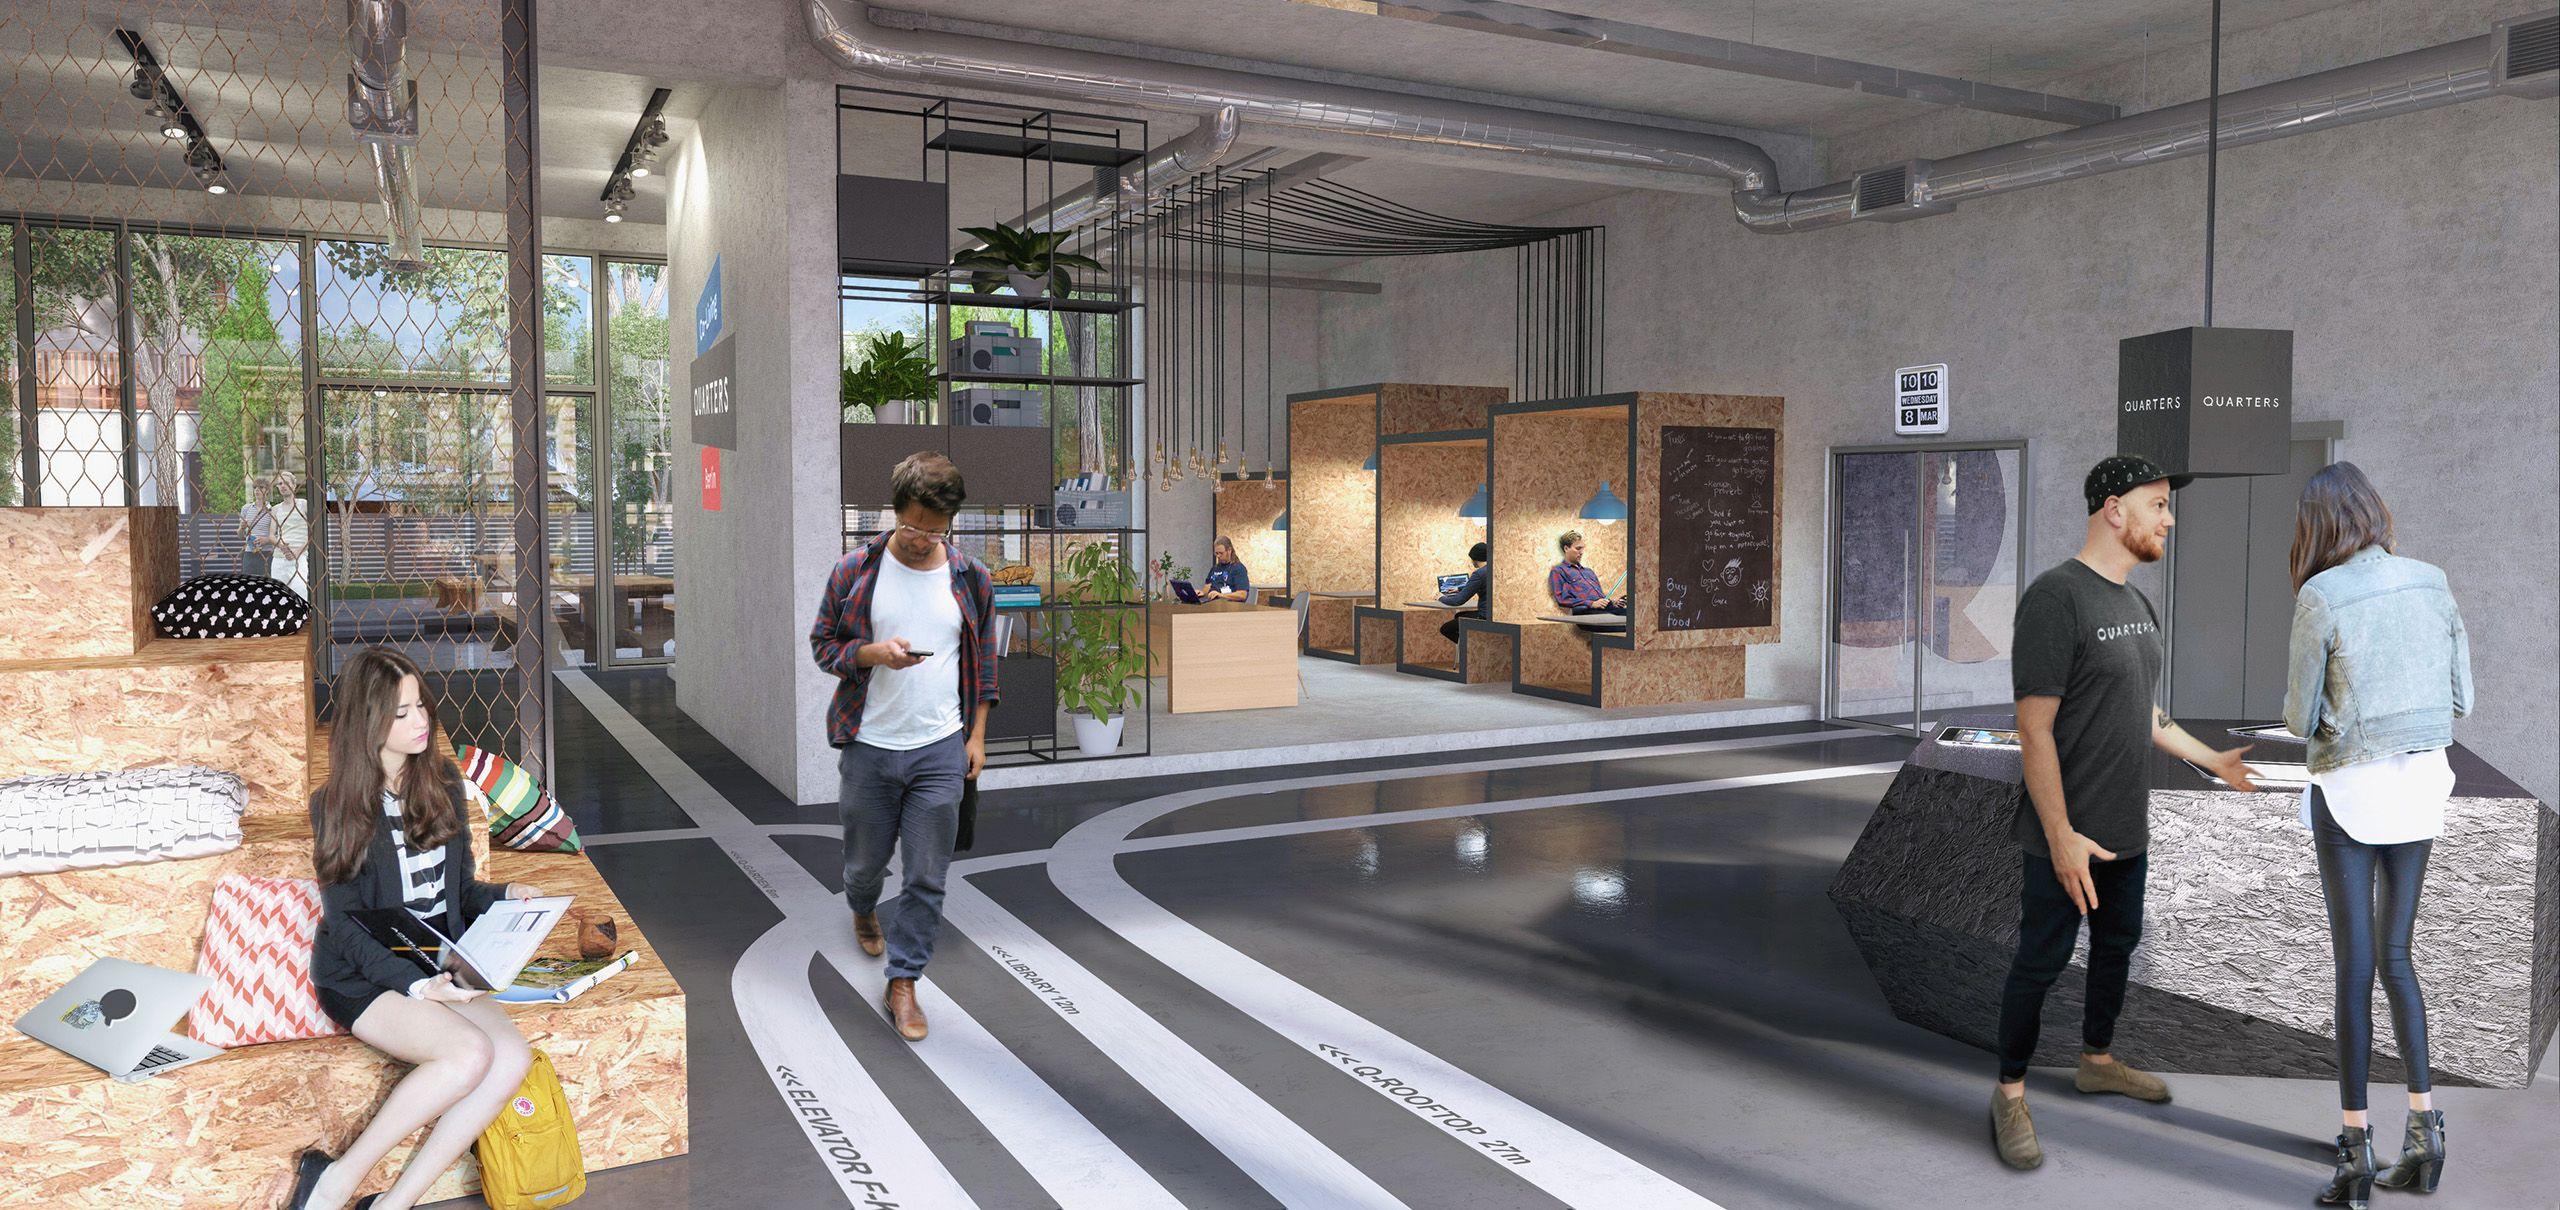 Architekturvisualisierung Berlin interior berlin lobby shared living quaters render